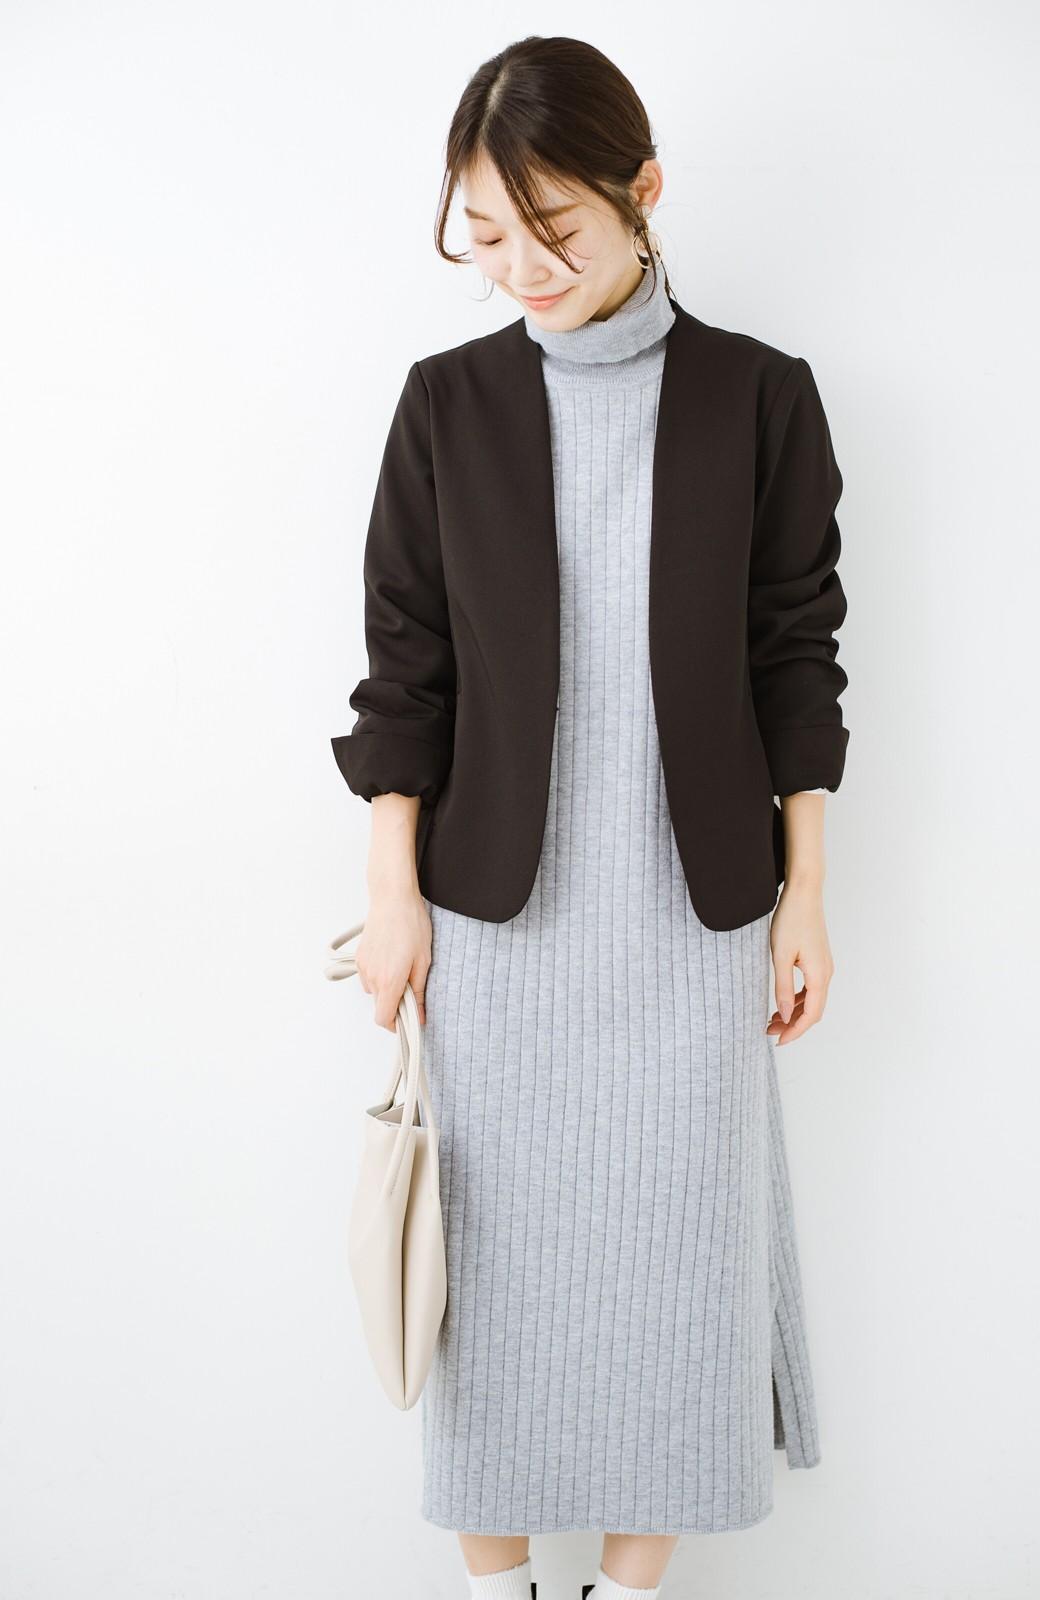 haco! セットで着るだけパッとかわいい ニットトップス&ノースリーブニットワンピースセット <グレー>の商品写真10